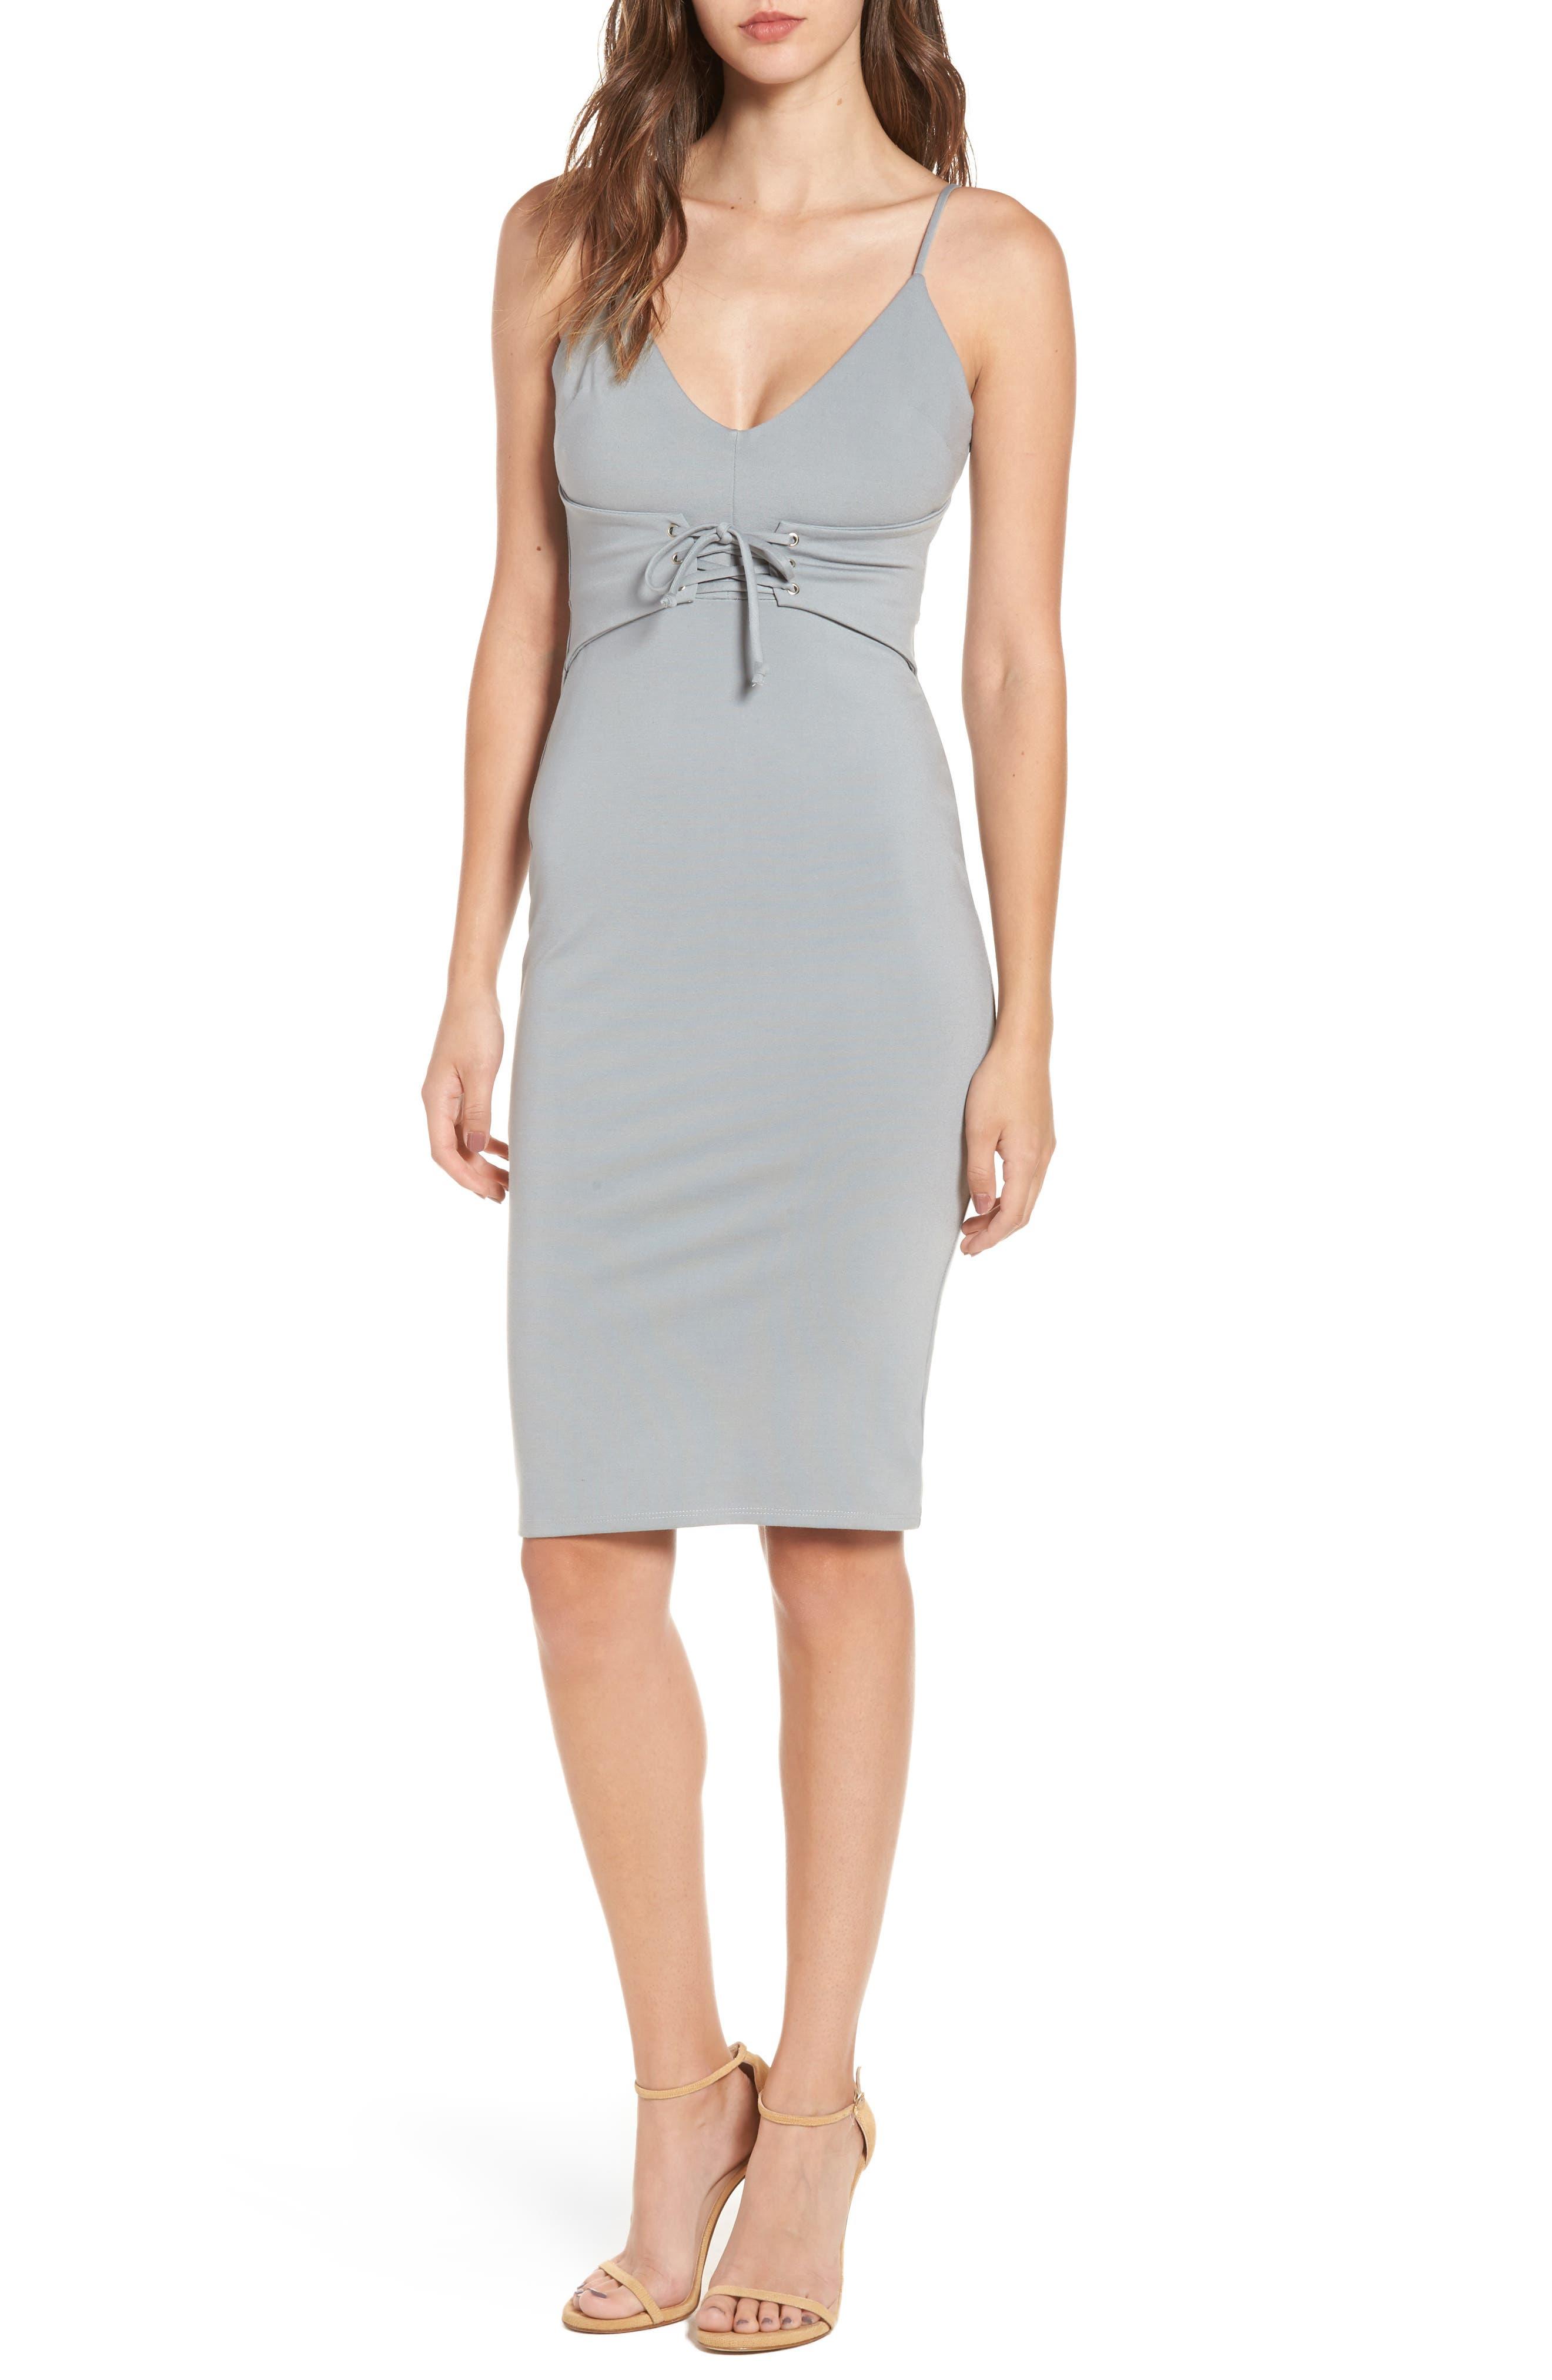 Main Image - 4SI3NNA Corset Detail Body-Con Dress